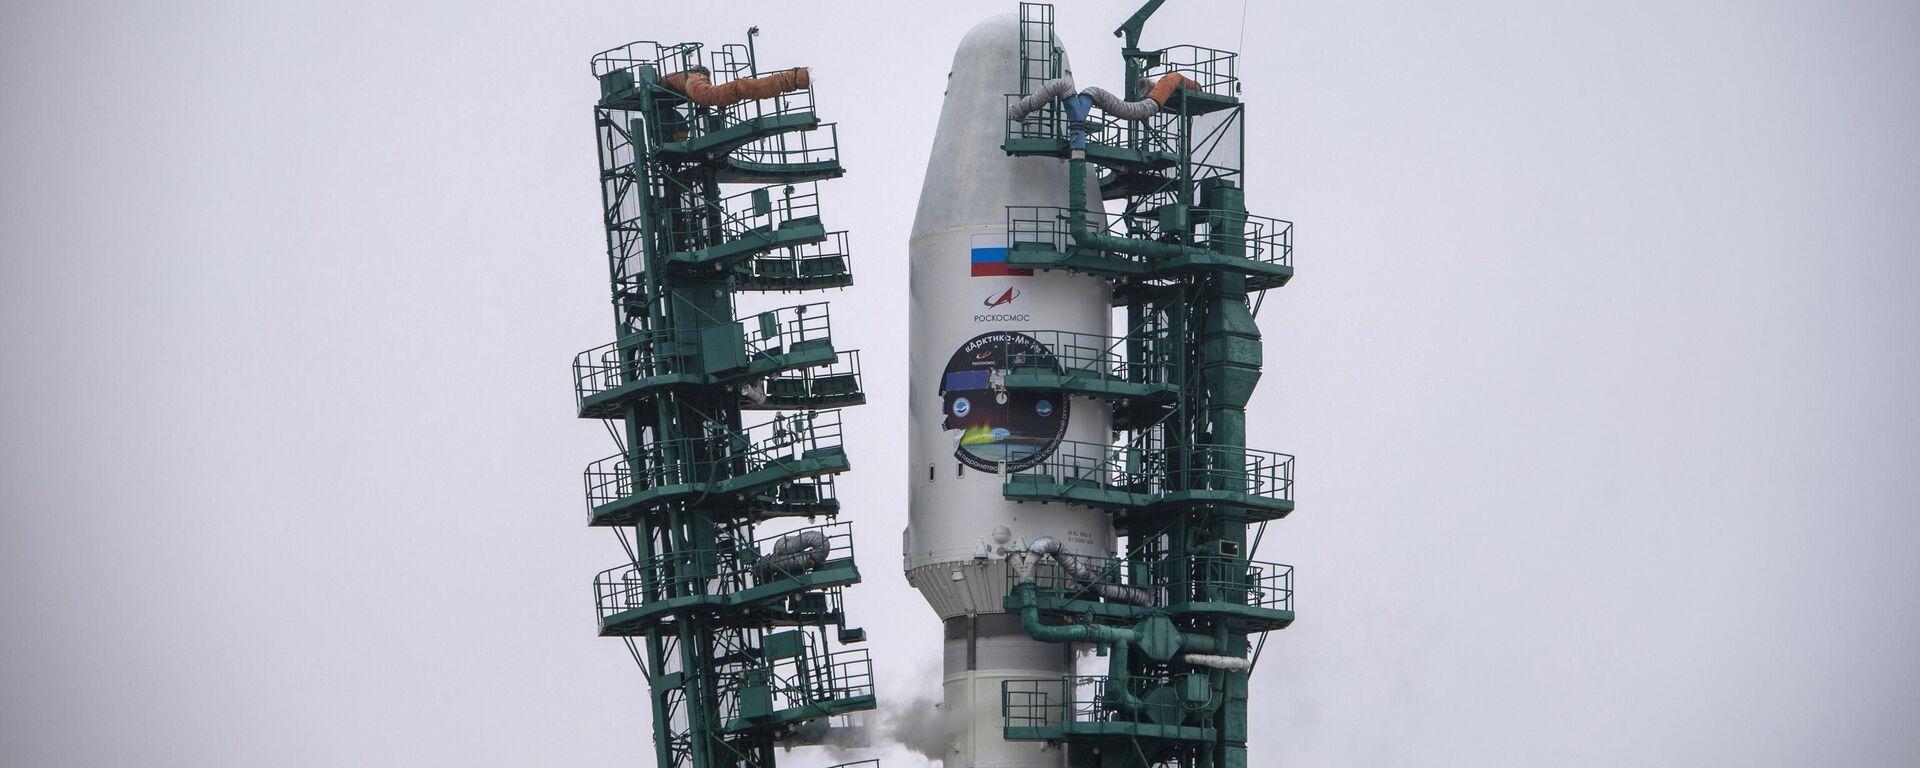 Start rakete-nosača Sojuz 2.1b sa kosmičkim aparatom Arktika M - Sputnik Srbija, 1920, 06.09.2021